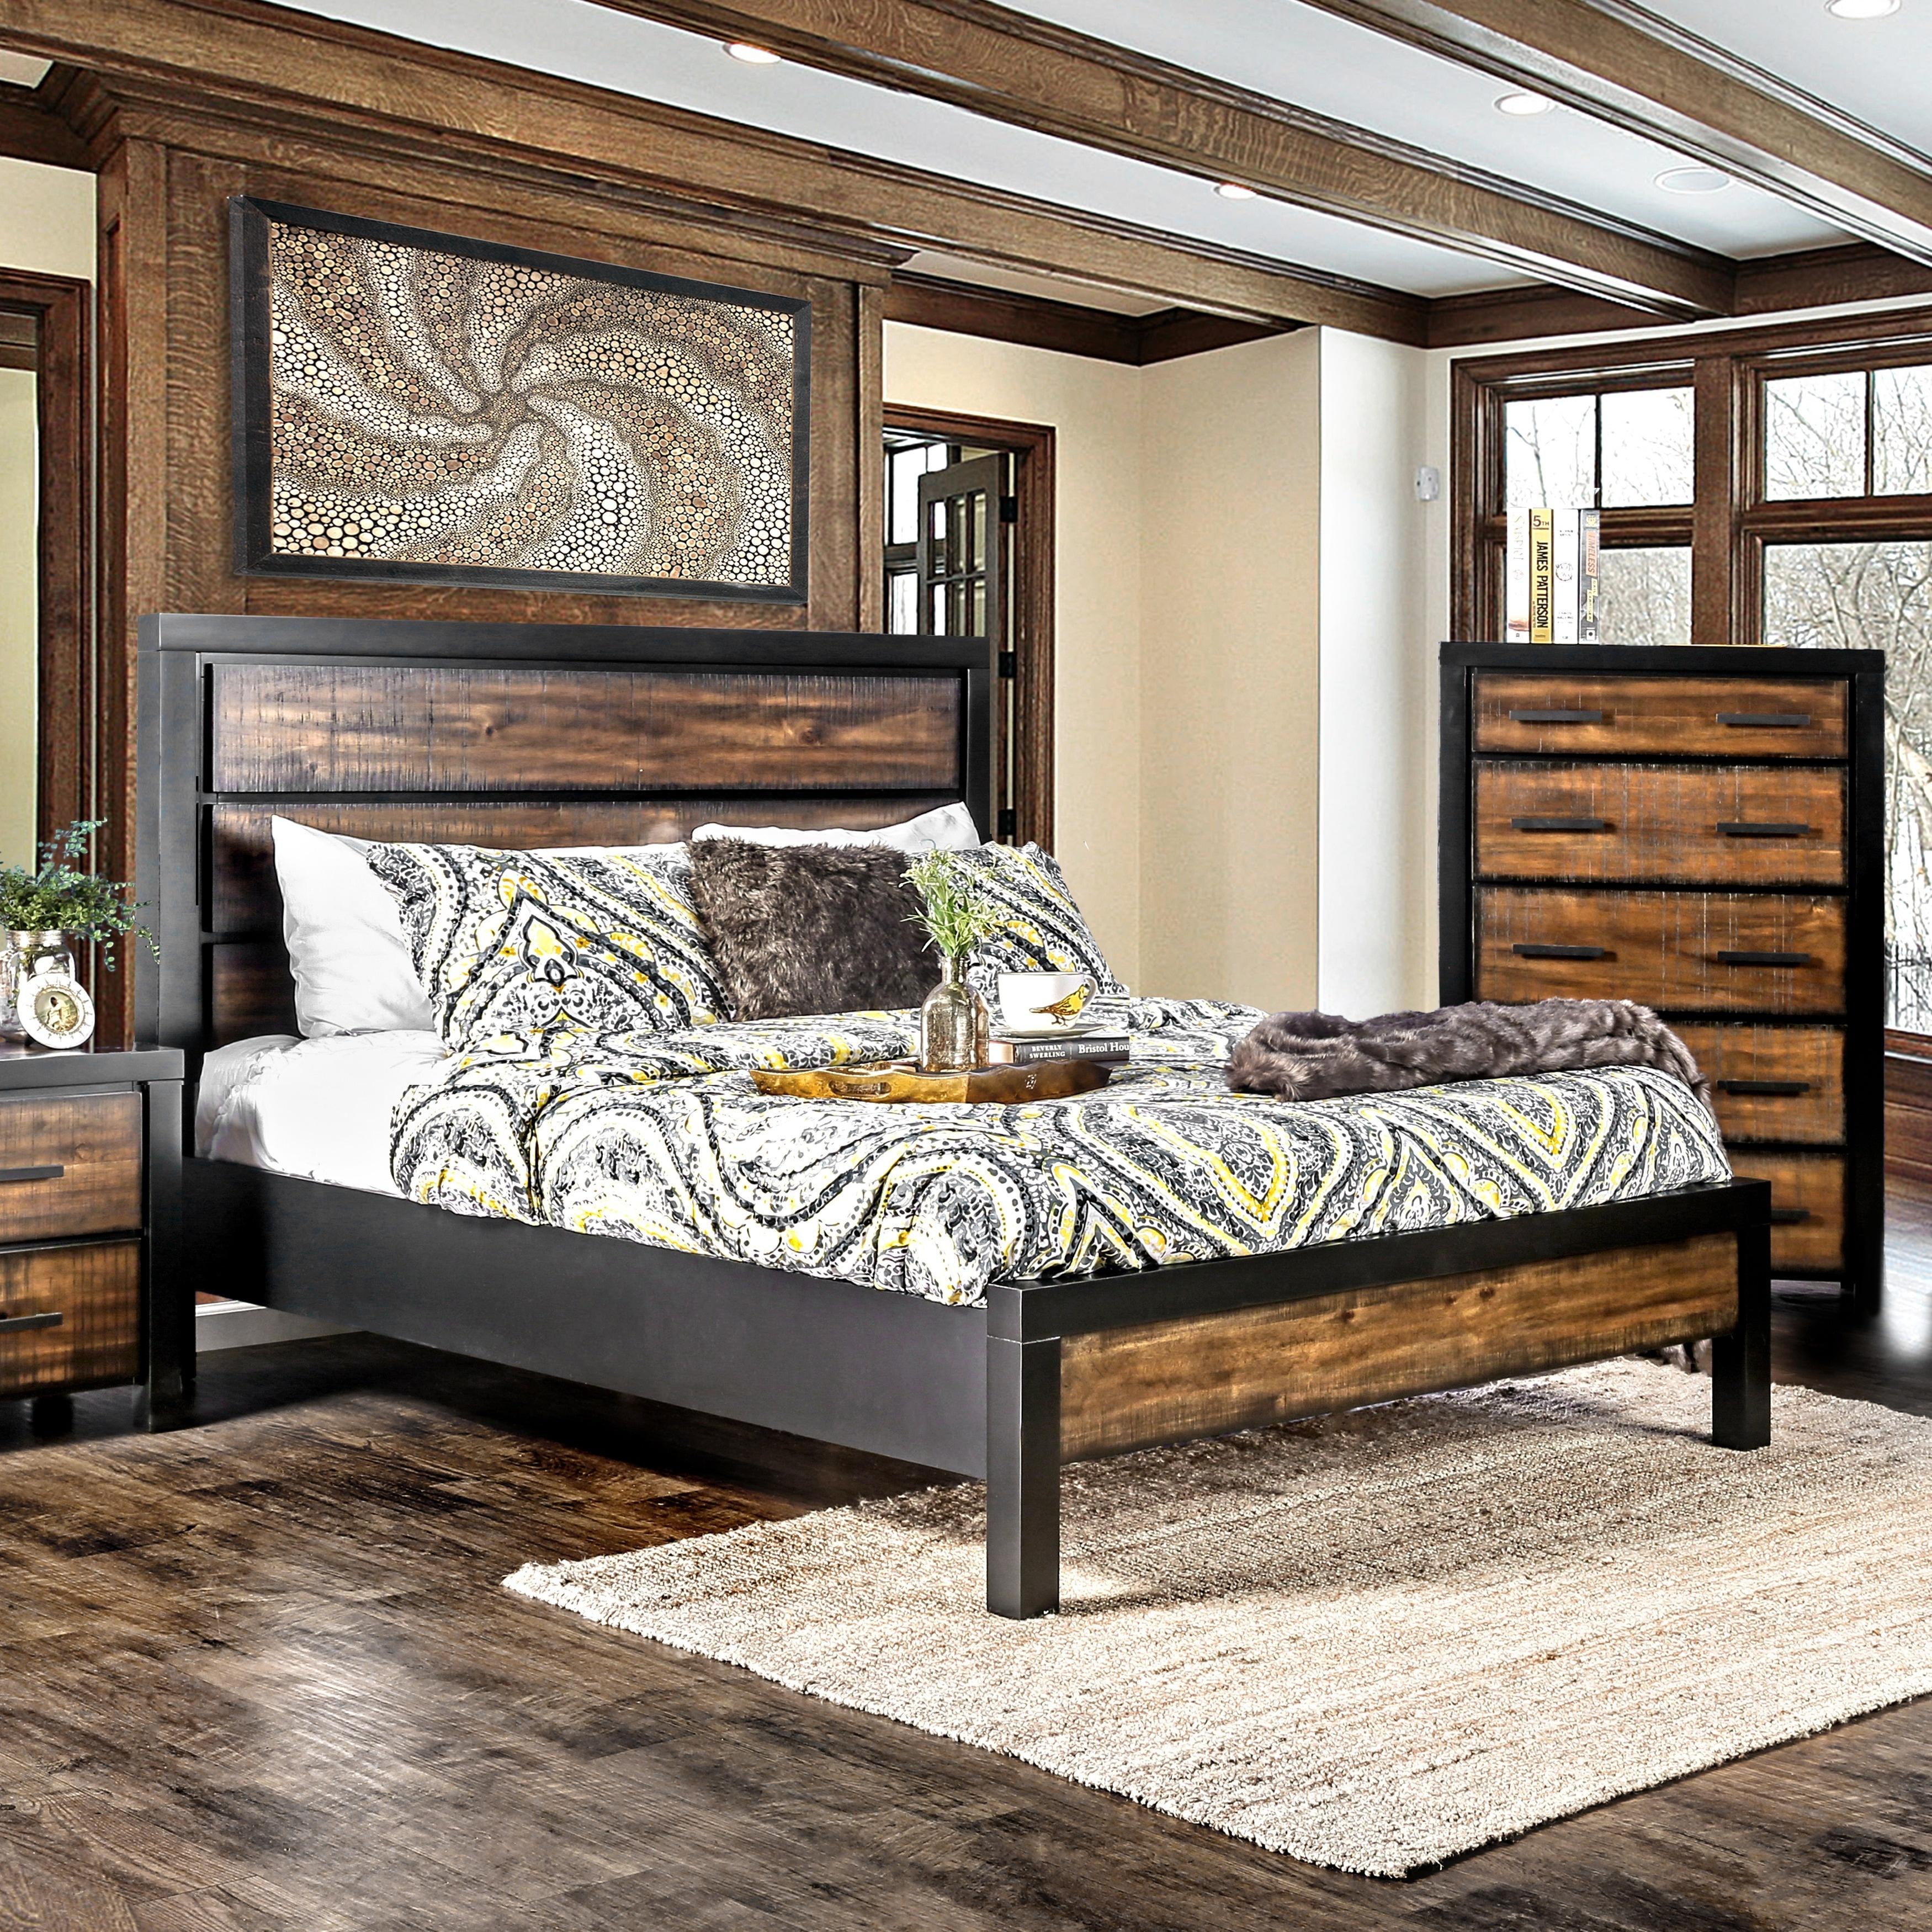 Furniture of america marson rustic two tone black oak platform bed